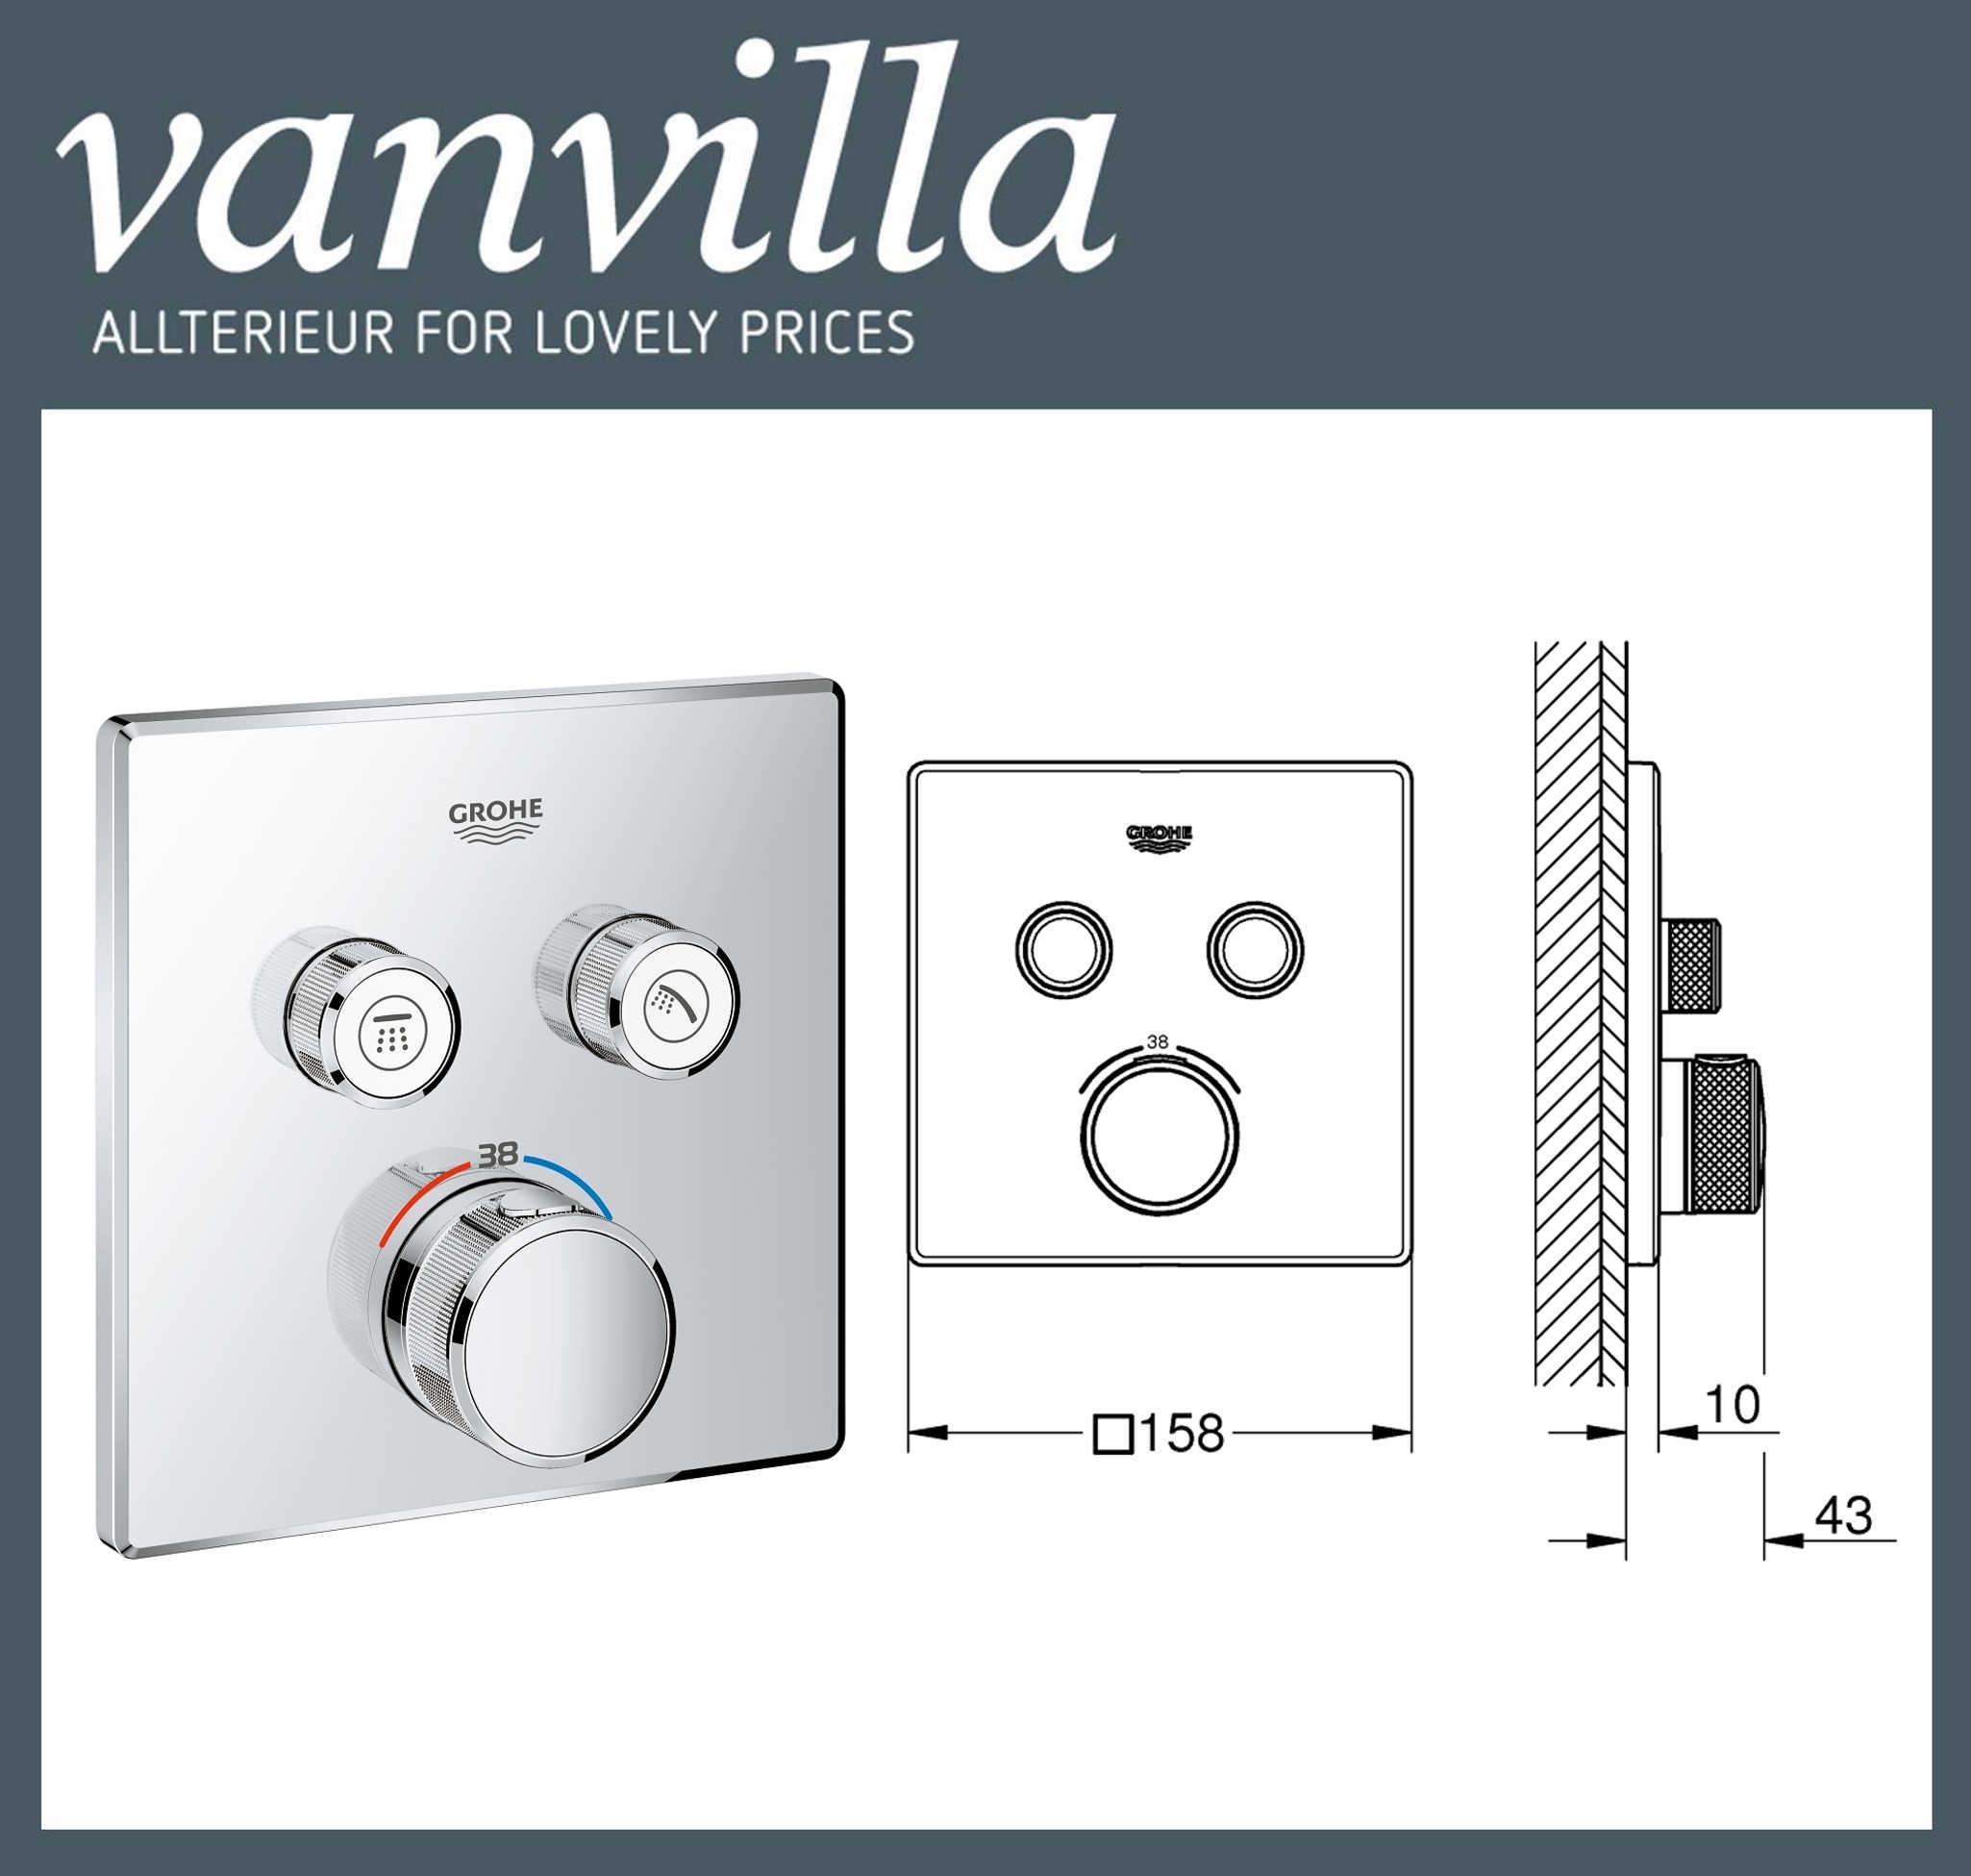 set g02 up poliert duschkopf 2wege grohe smartcontrol thermostat 29124. Black Bedroom Furniture Sets. Home Design Ideas